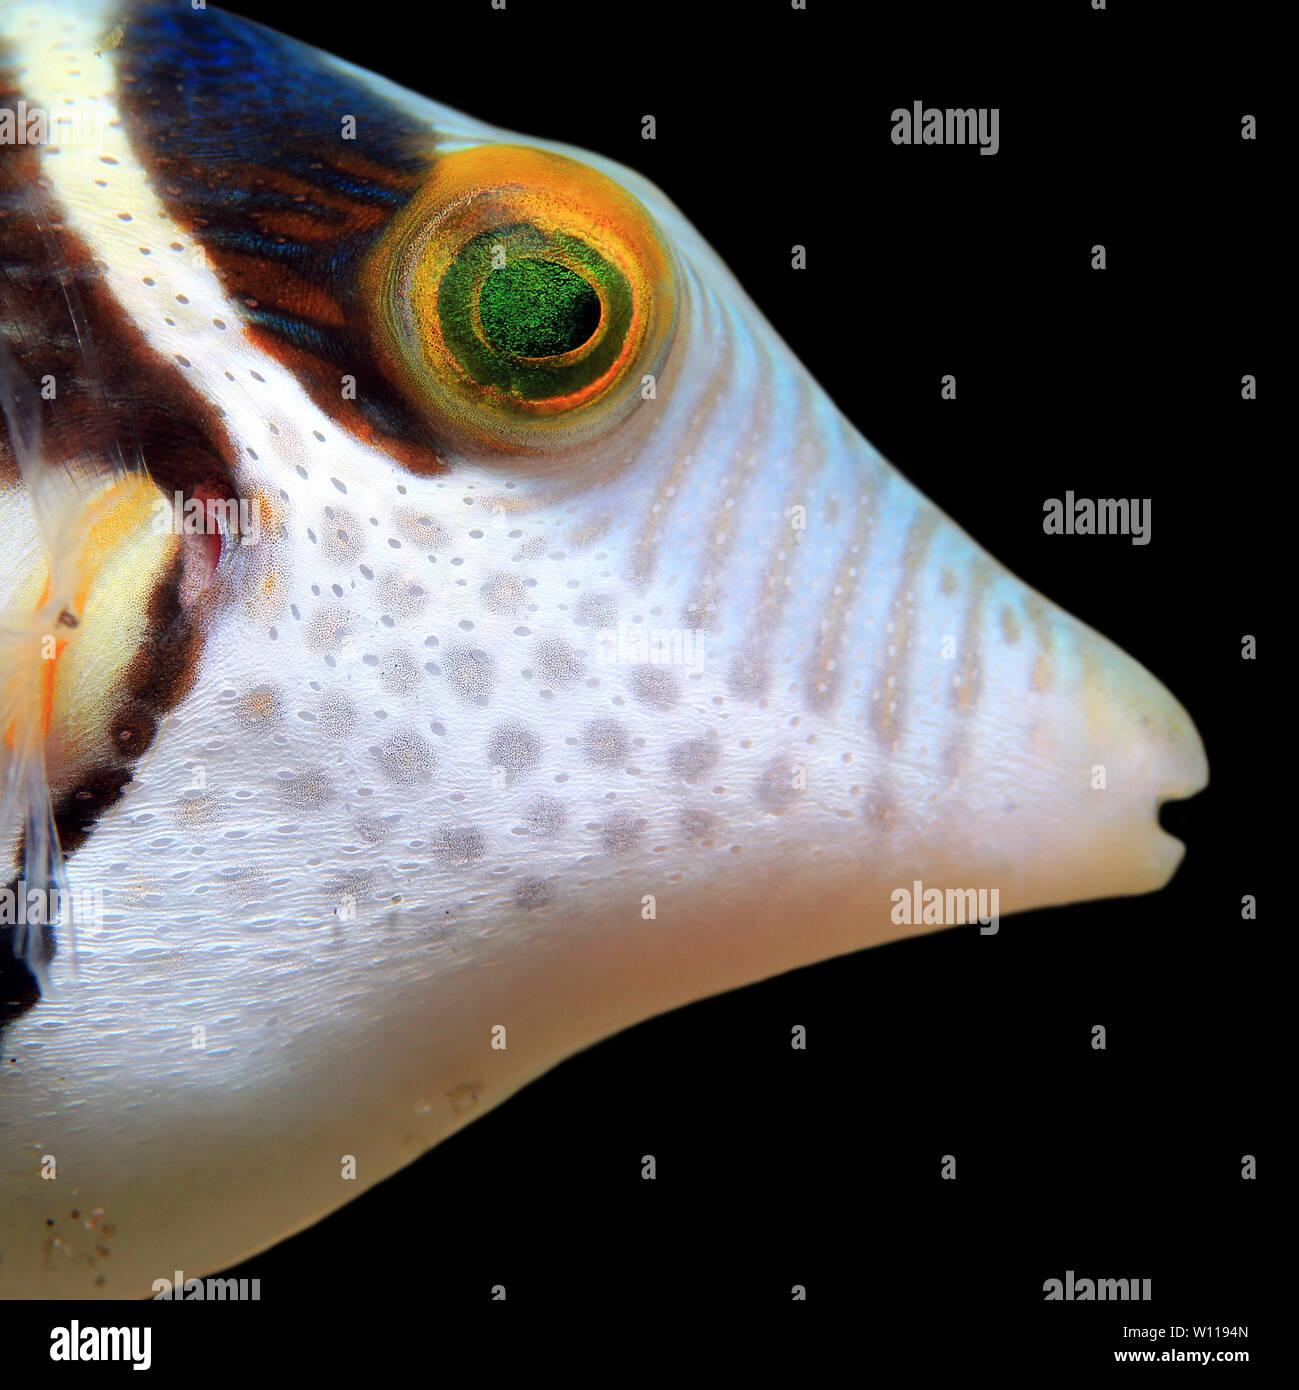 Close-up of a Black-saddled Toby (Canthigaster Valentini, aka Valentinnis Sharpnose Pufferfish, Valentinnis Sharpnose Puffer, Valentine Pufferfish, Va Stock Photo